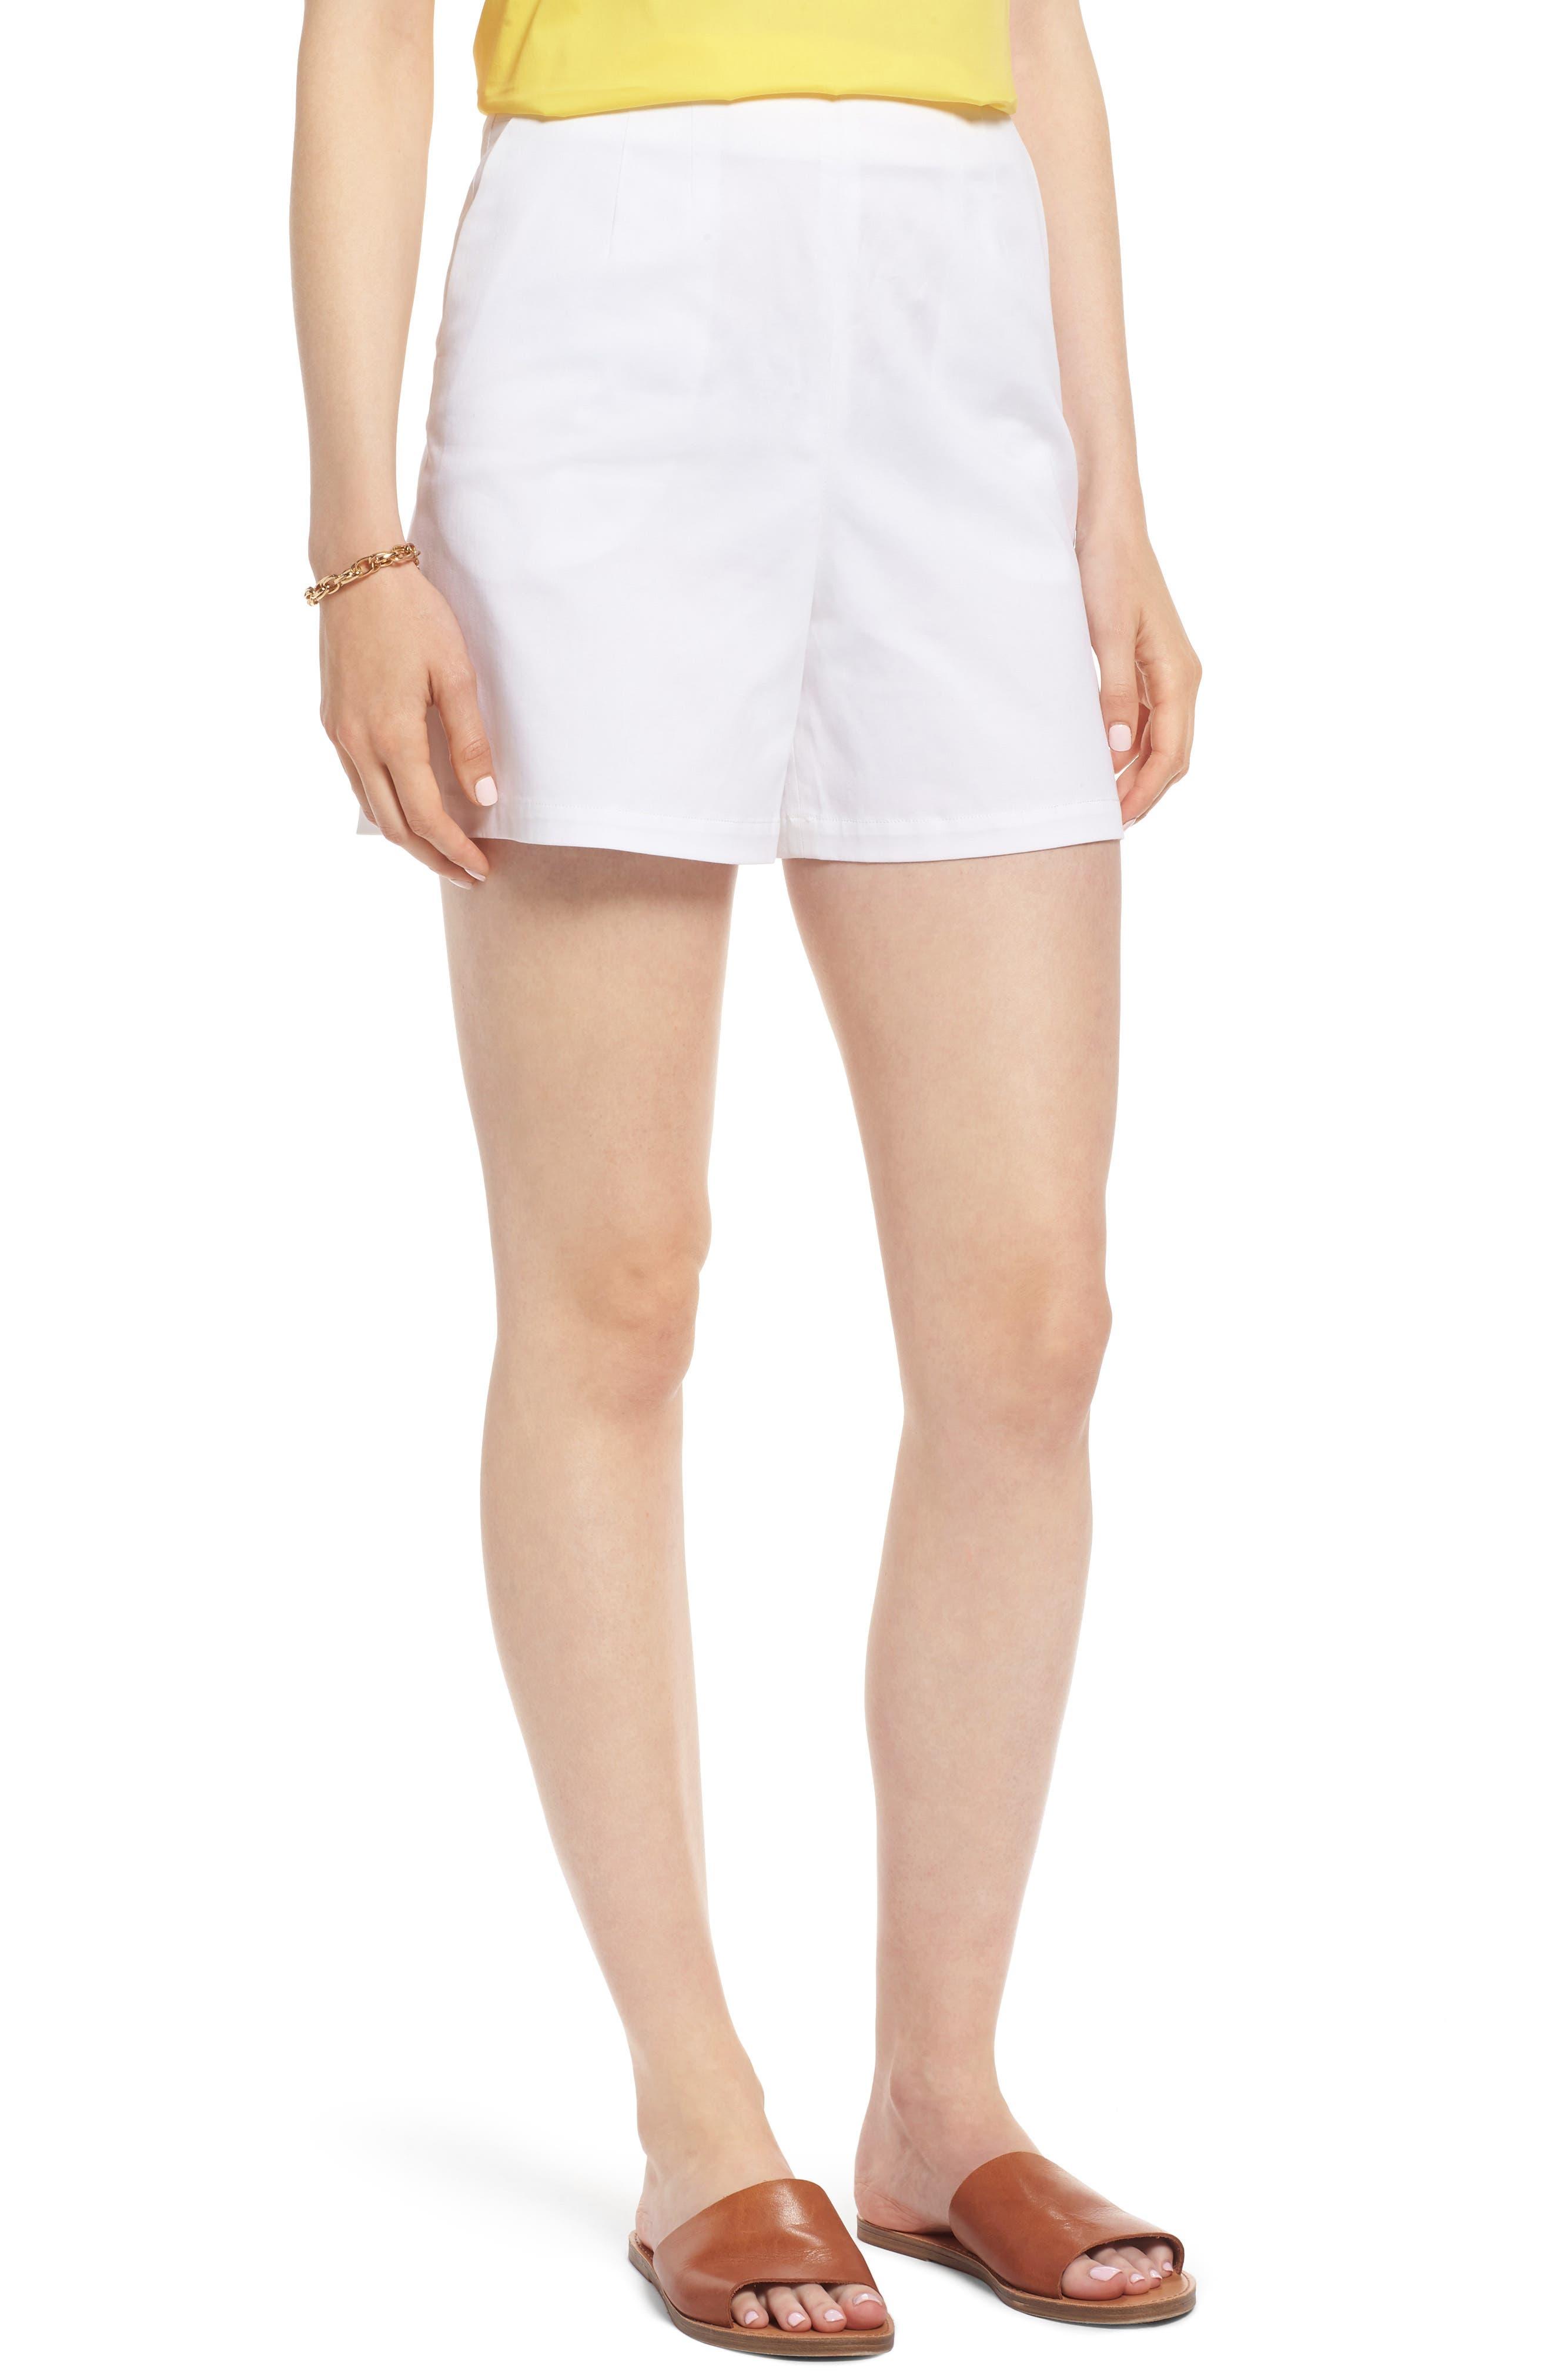 Clean Twill Shorts,                             Main thumbnail 1, color,                             100